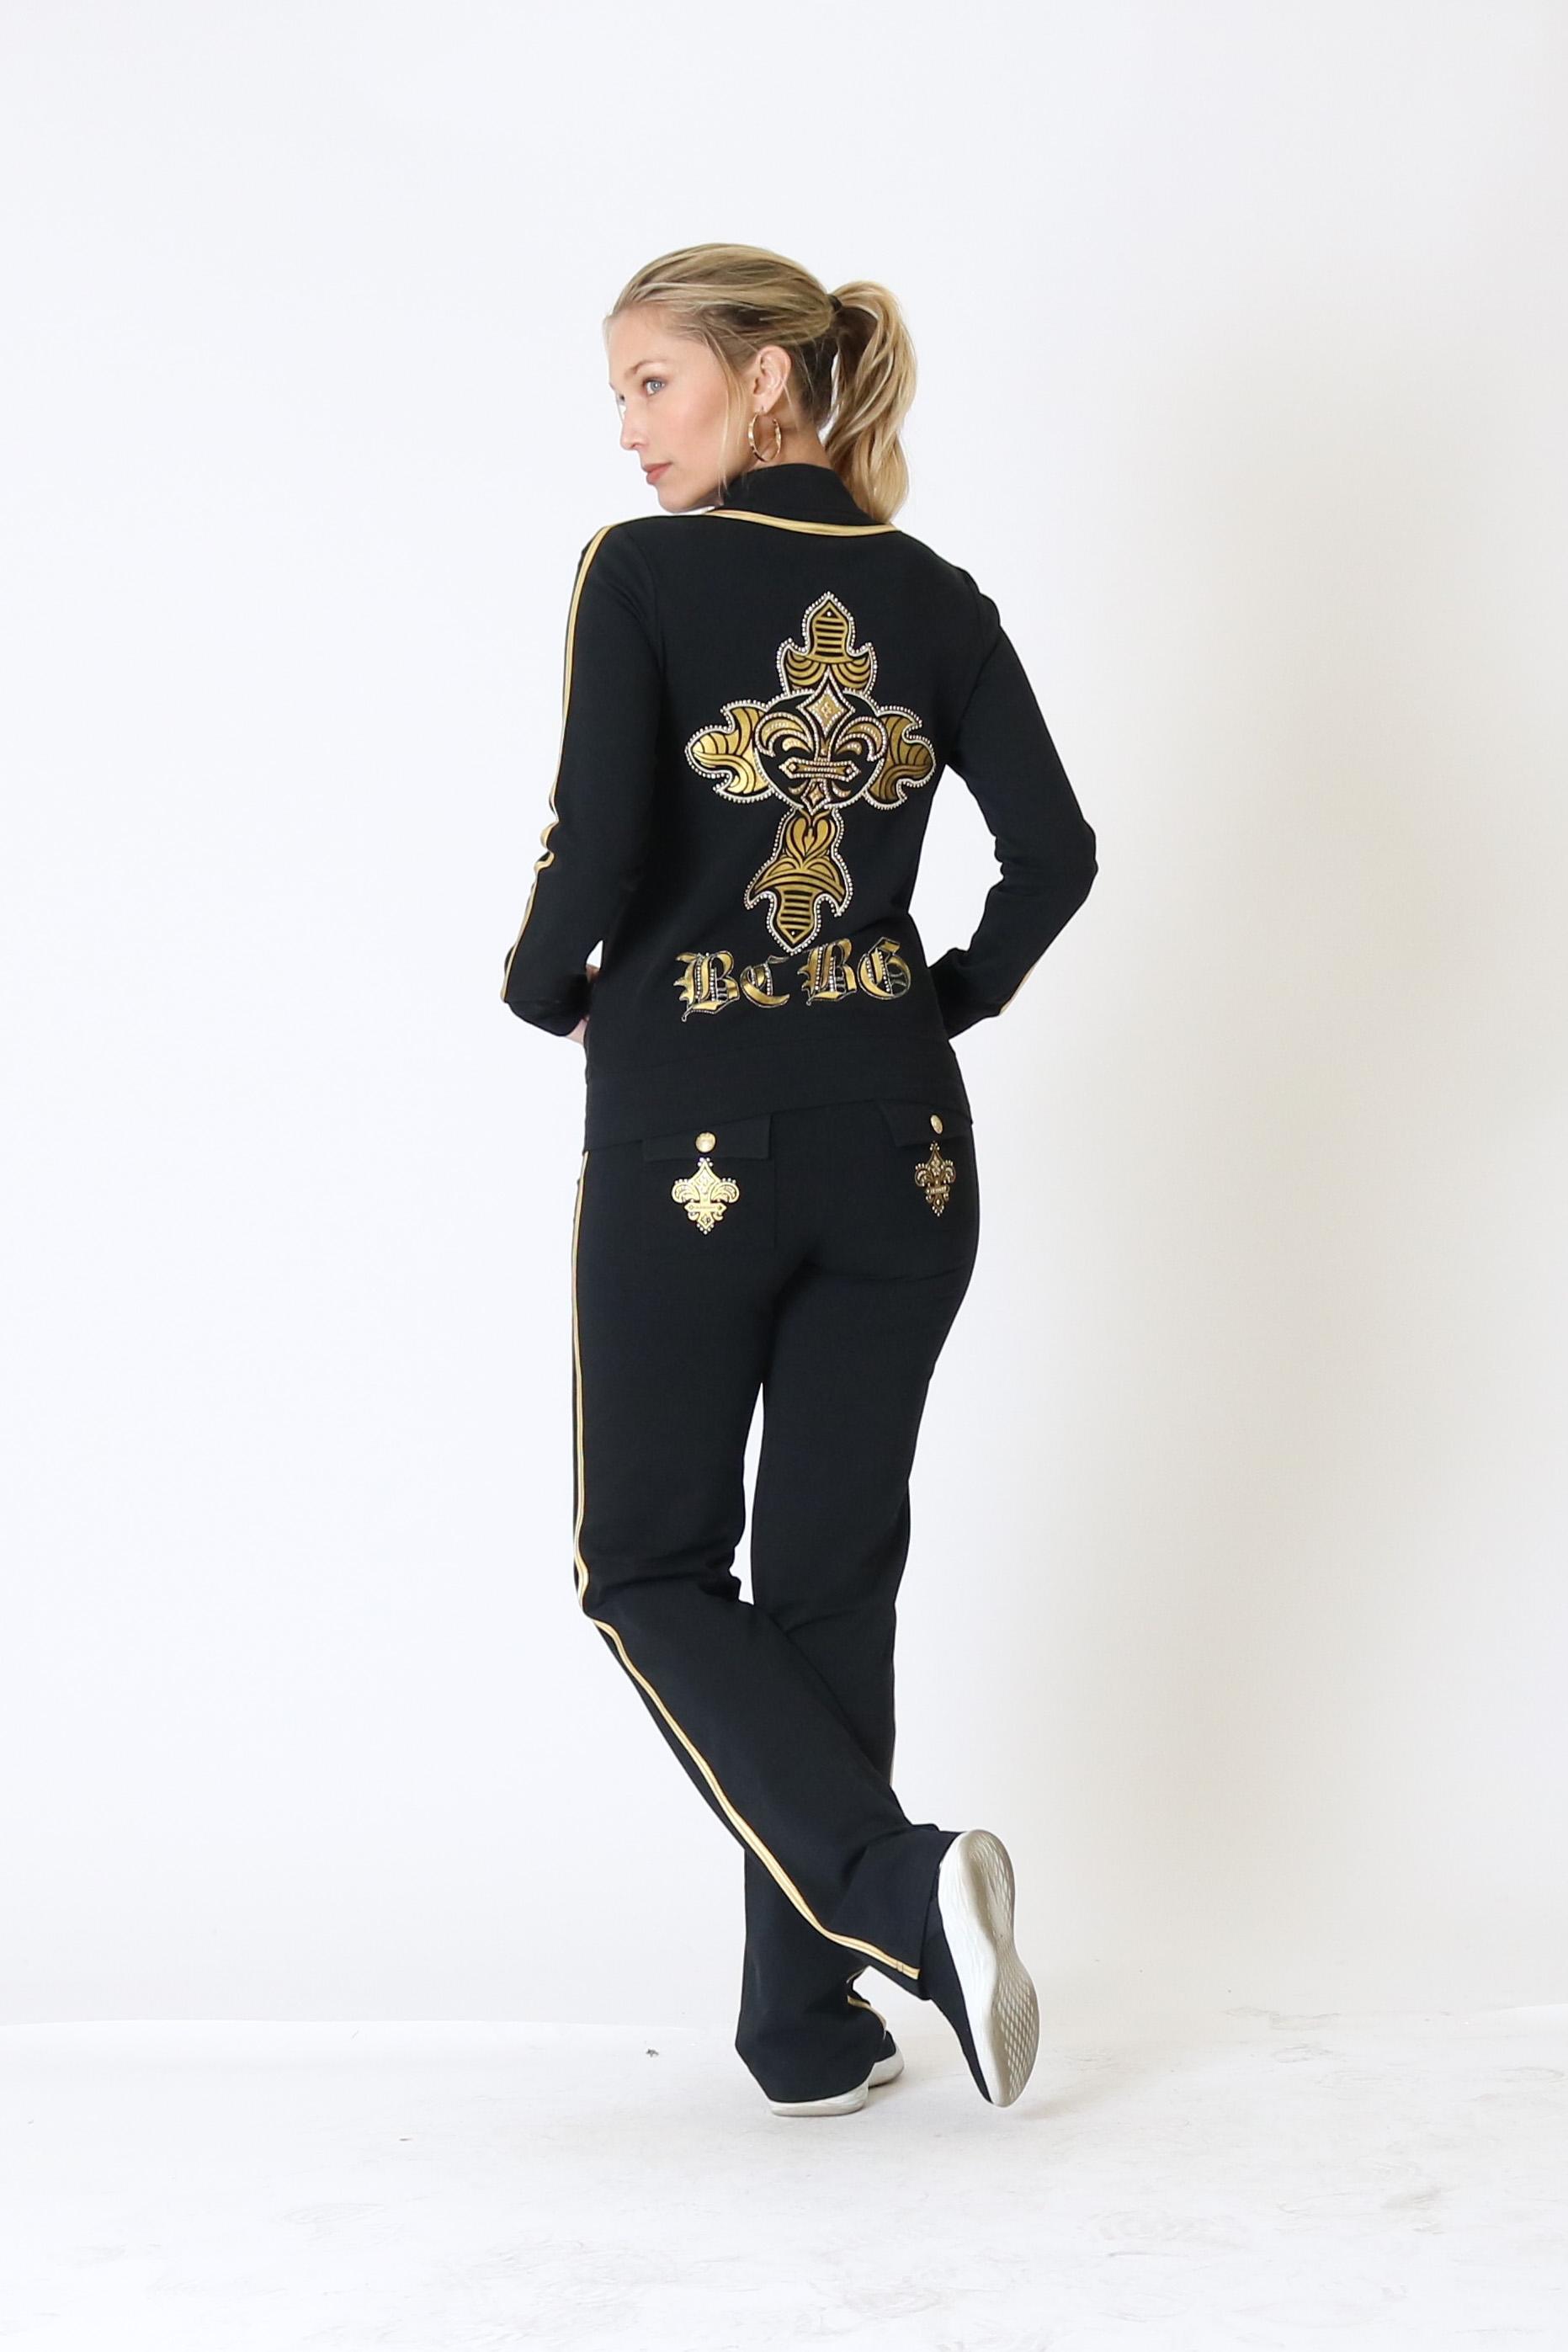 BCBG-Women-039-s-Lounge-Wear-2-Piece-Embellished-Jacket-and-Pants-Jogger-Set thumbnail 12